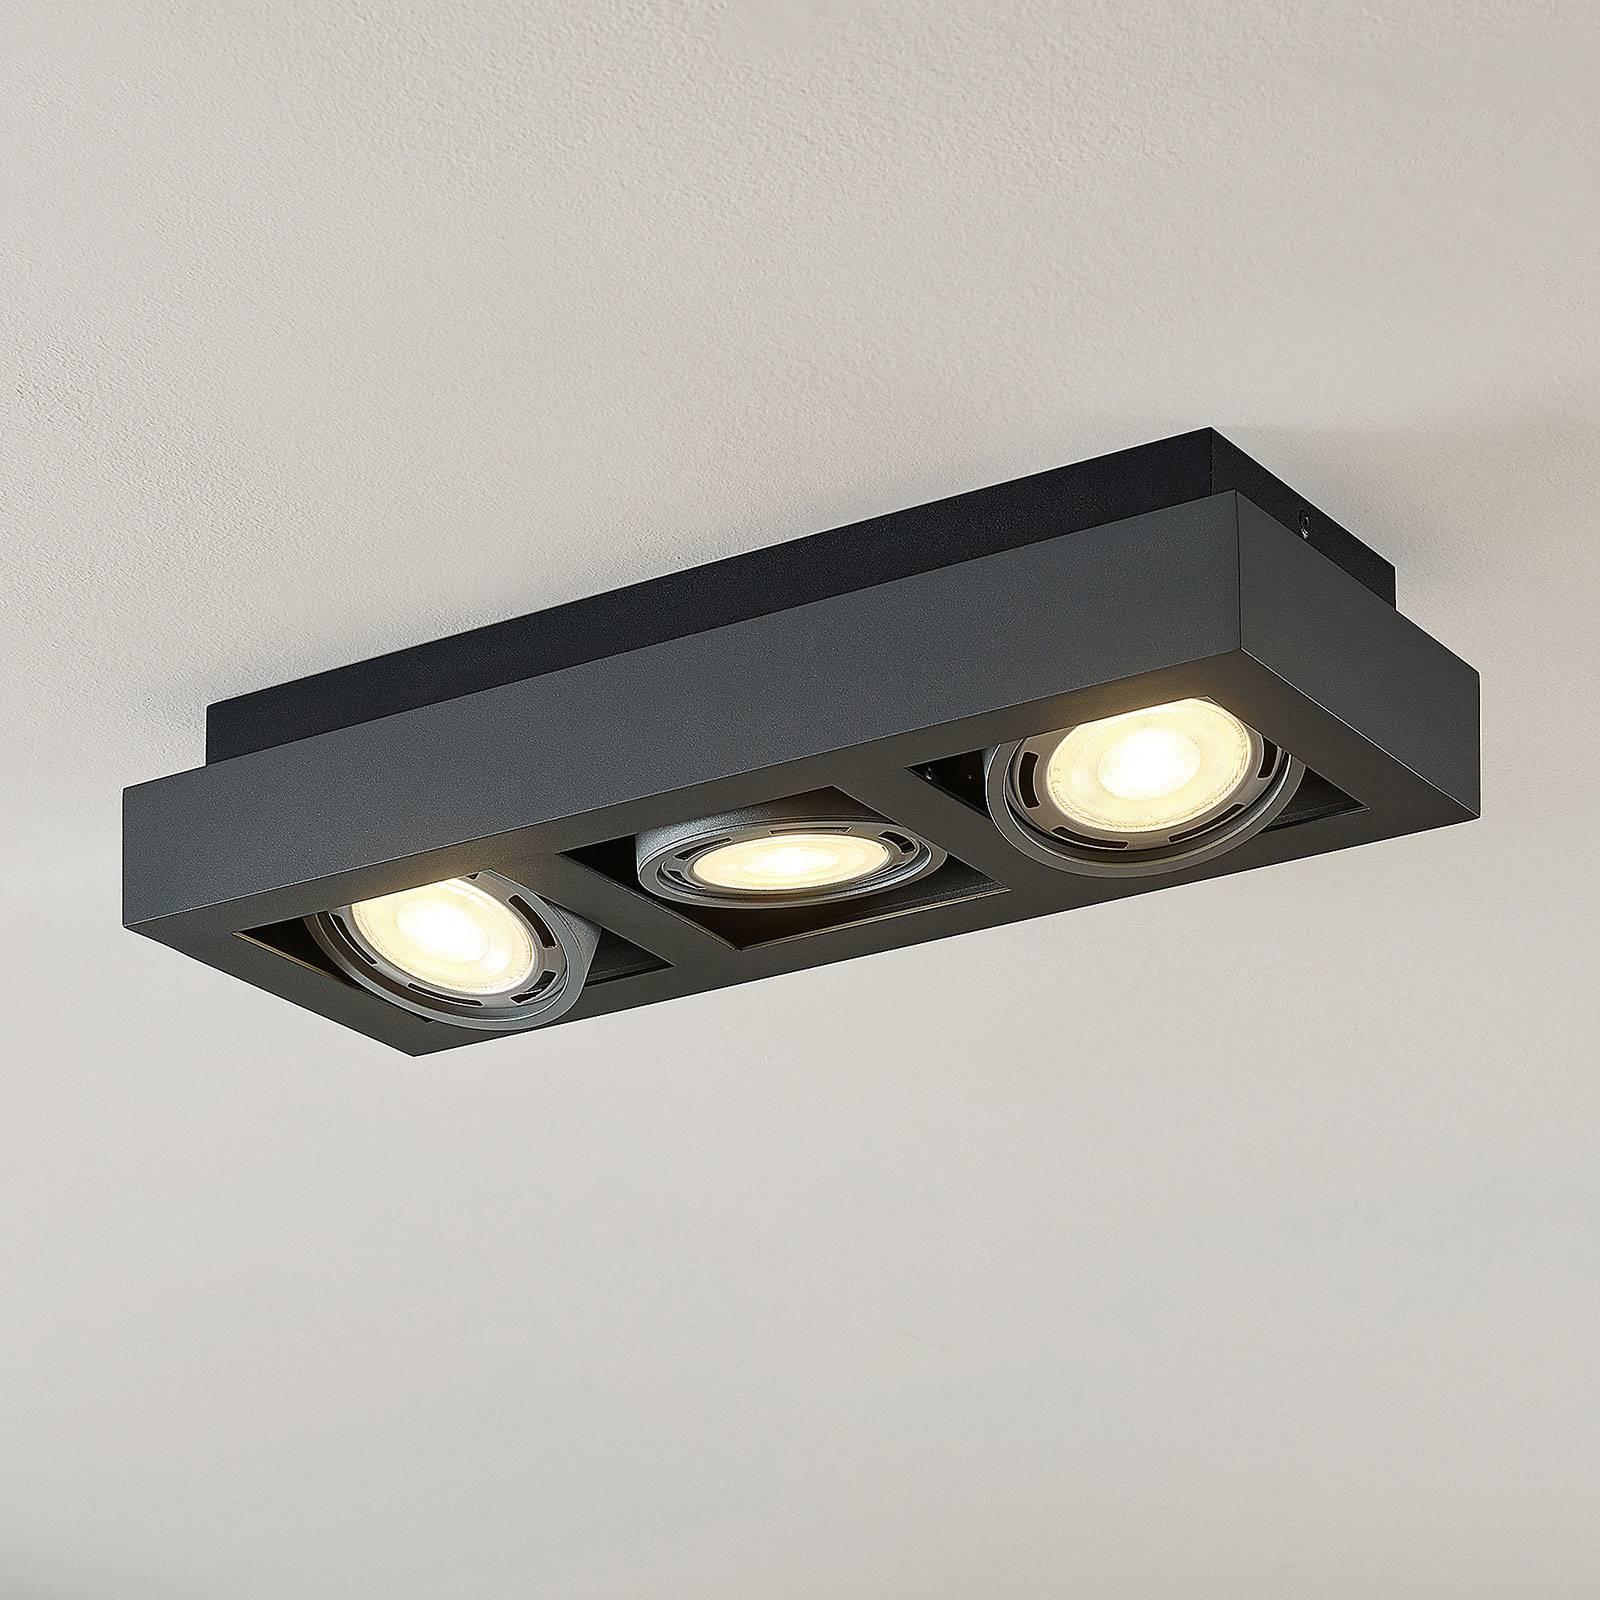 LED-Deckenstrahler Ronka, GU10, 3-fl., dunkelgrau